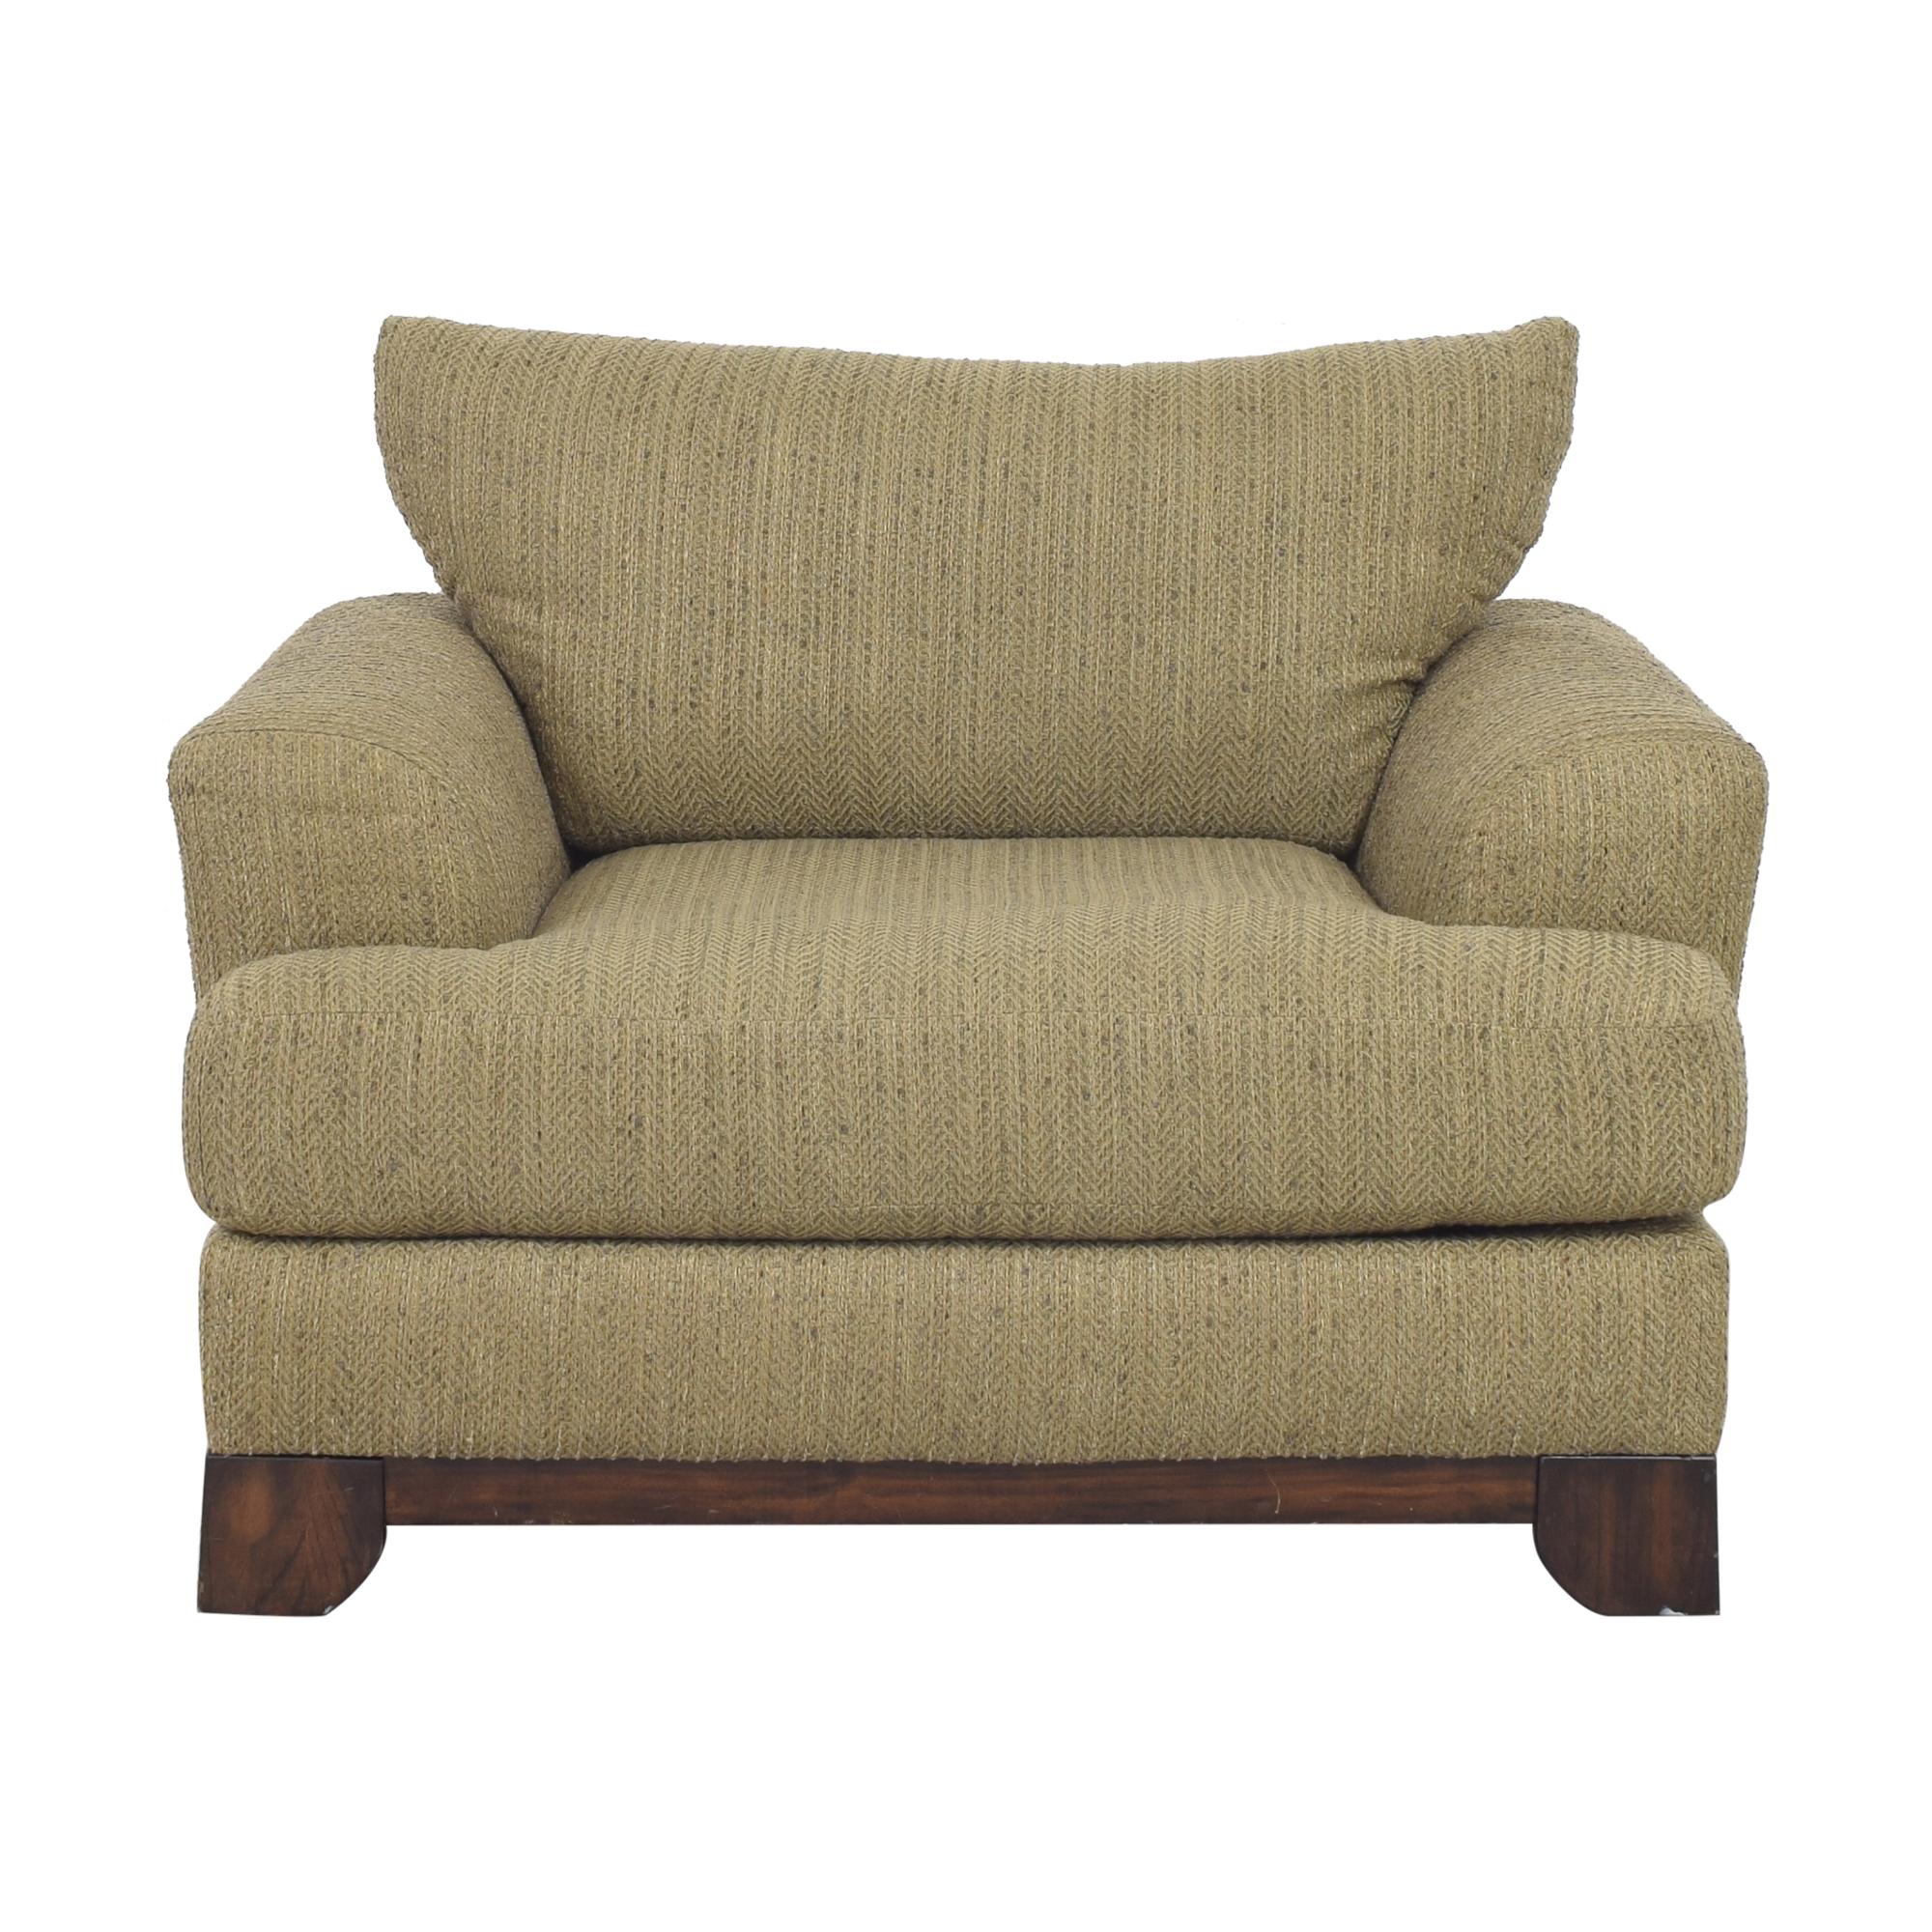 buy Schnadig Chair and a Half Schnadig